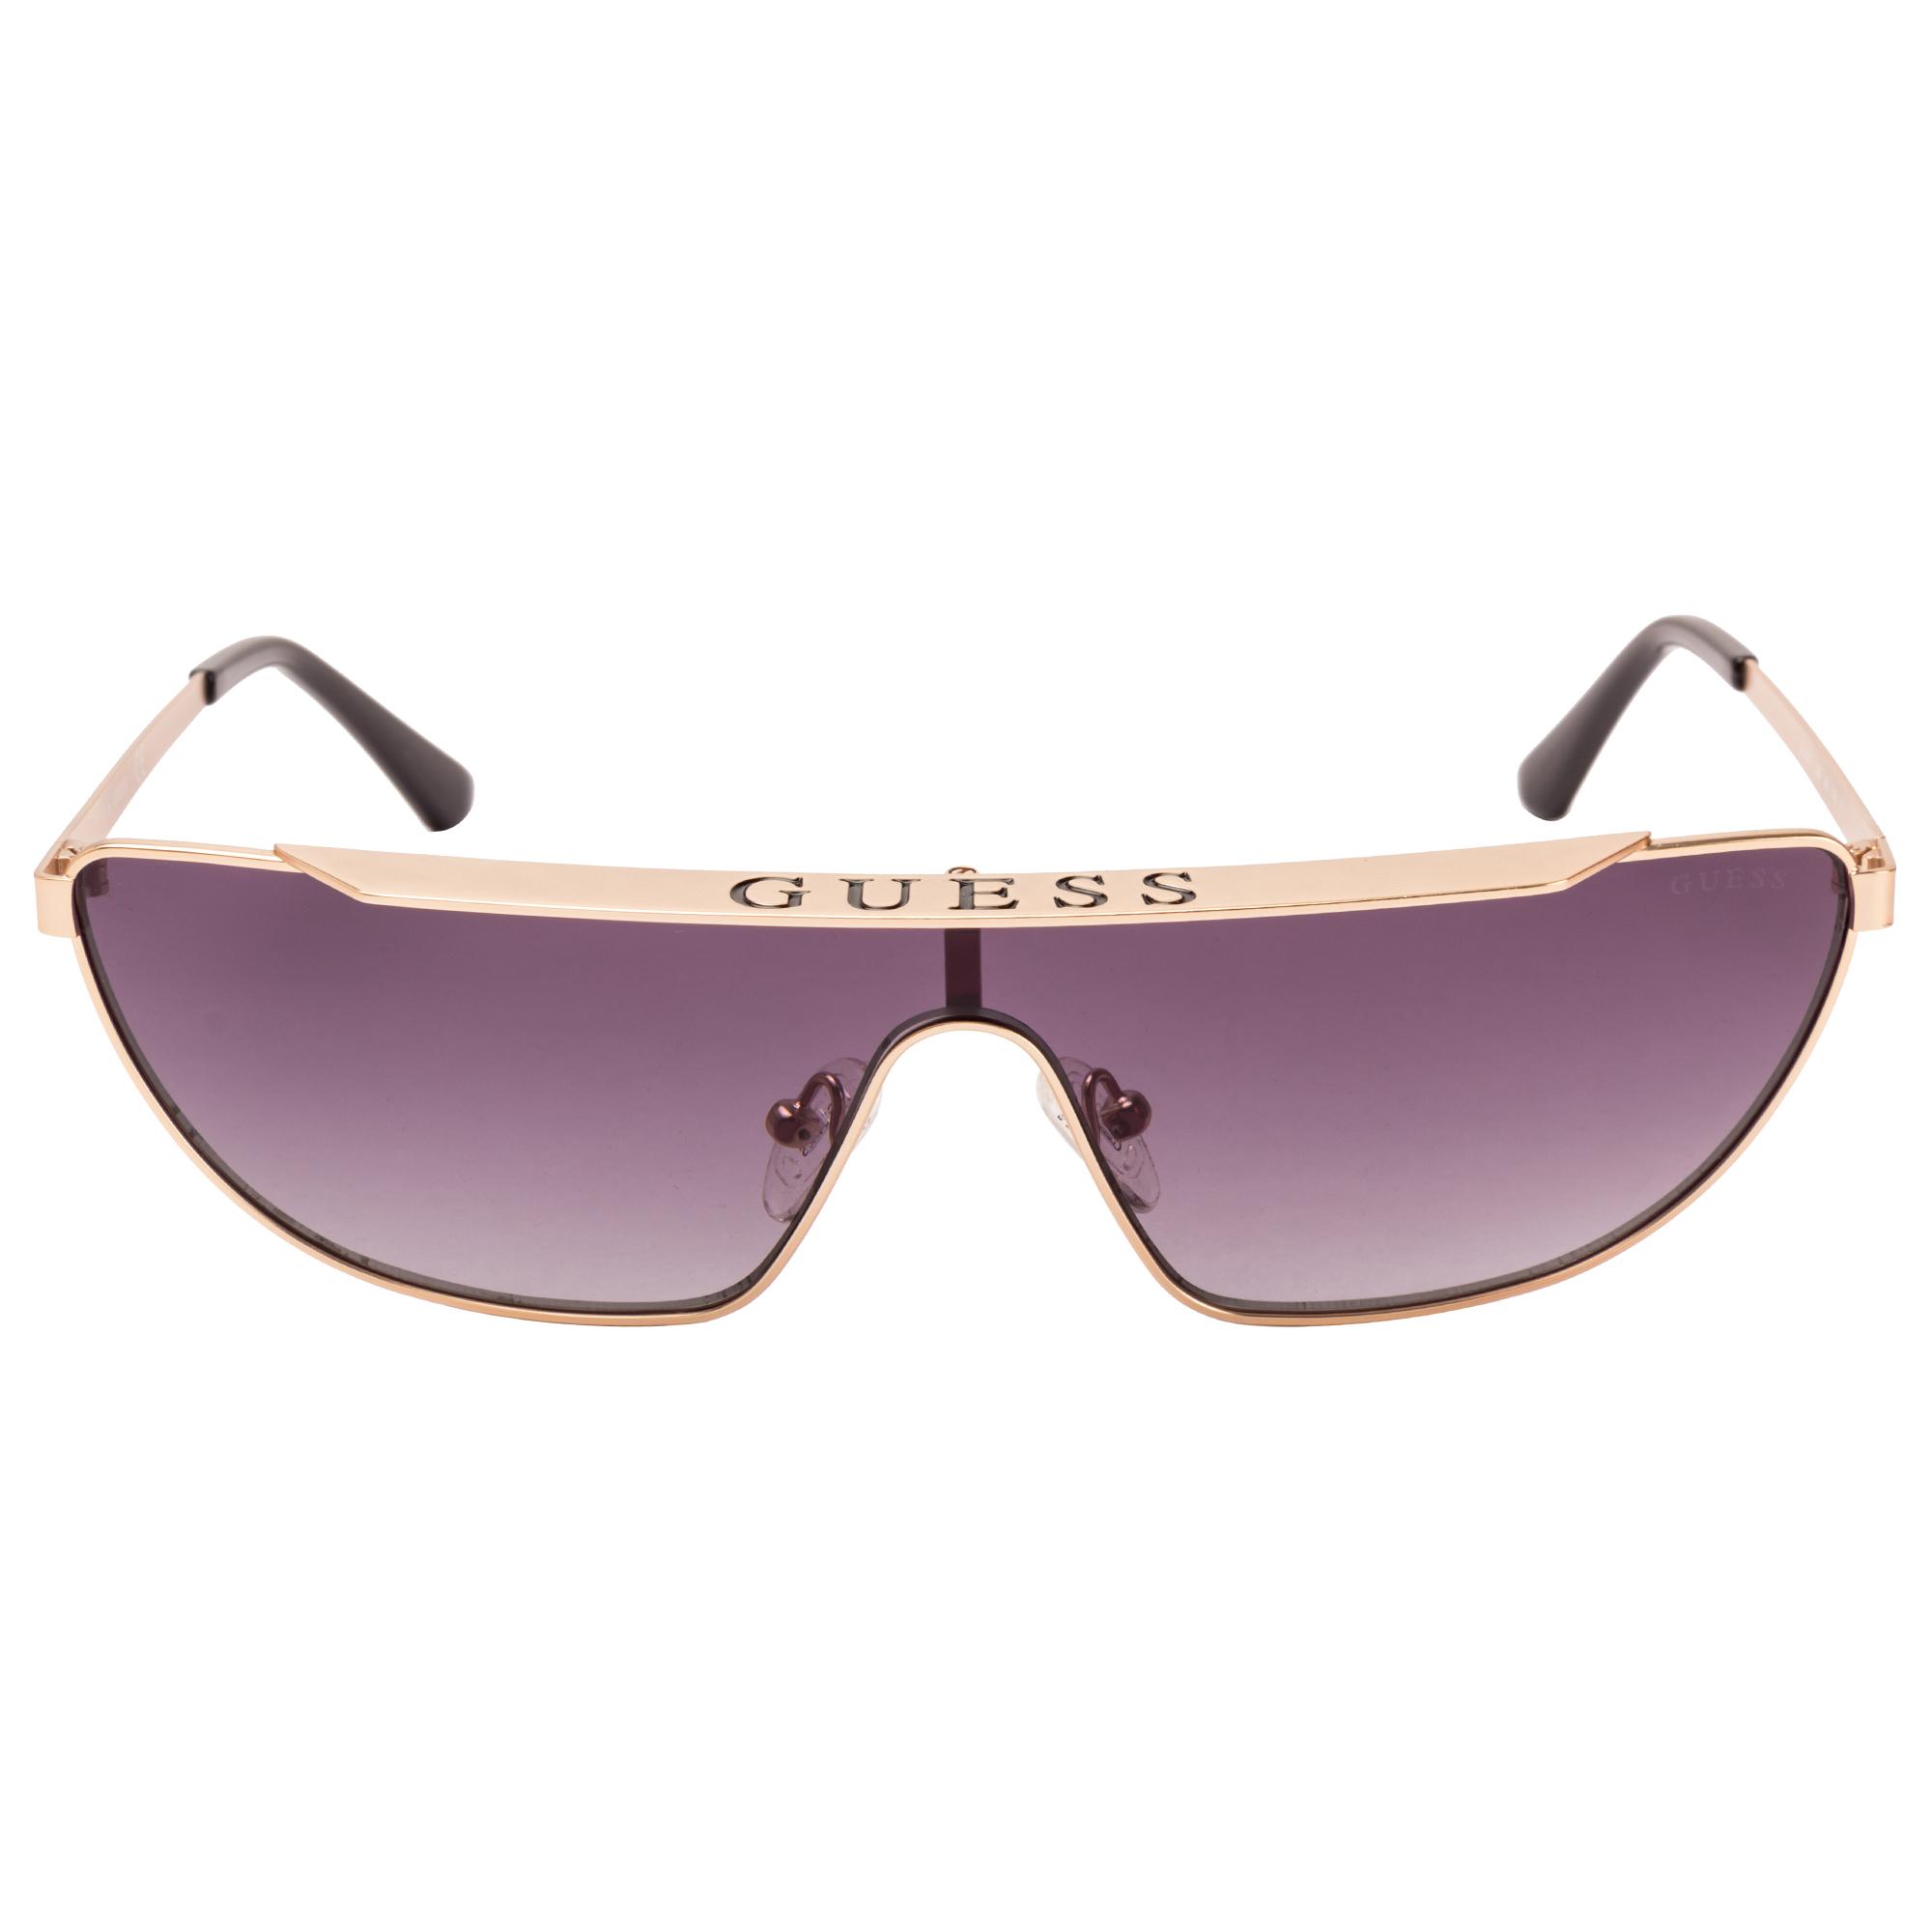 GUESS | Guess Gold Frame With Grey Lens Shield Shape Women Sunglass